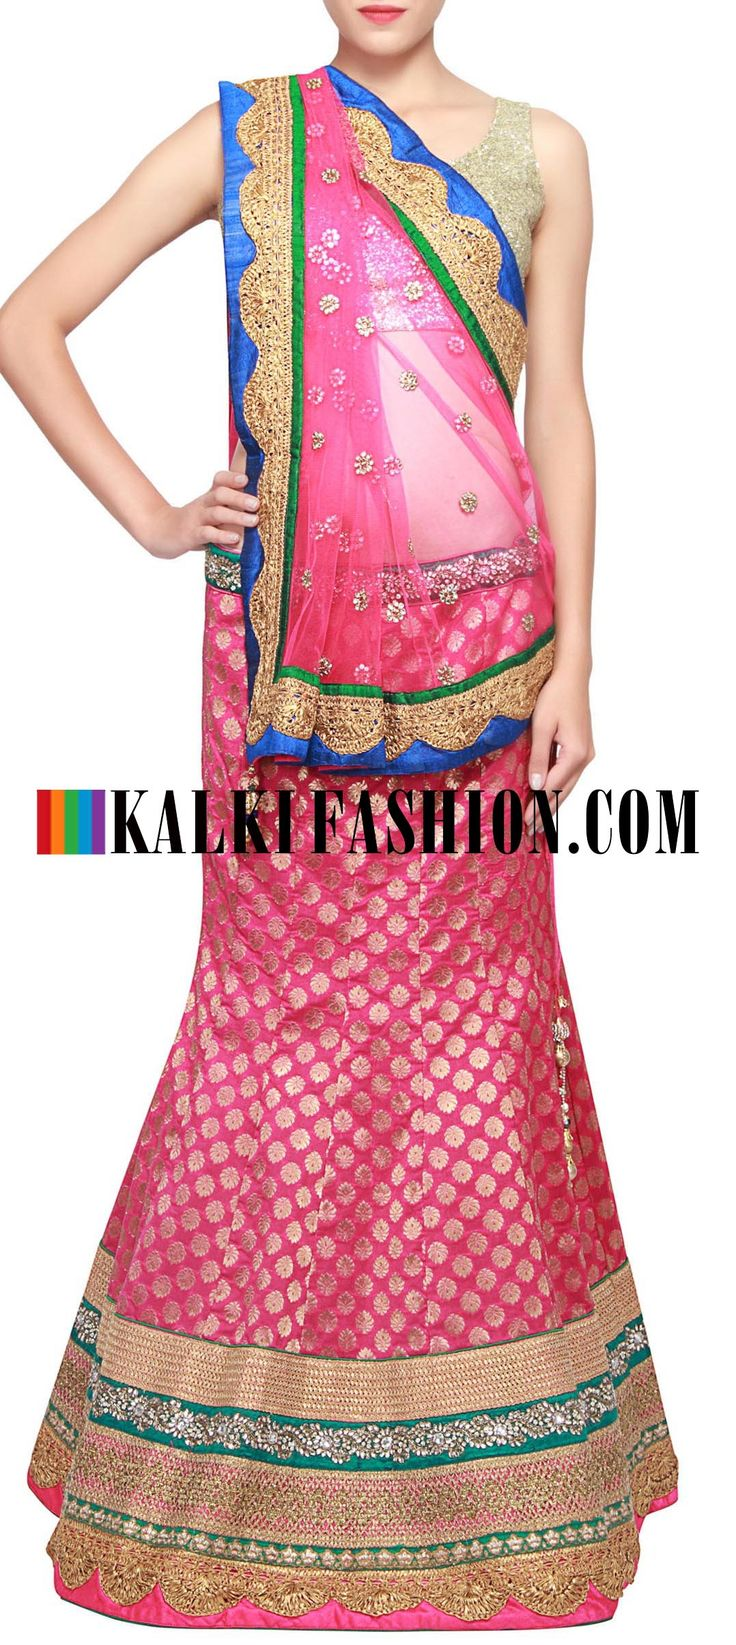 Get this beautiful lehenga here: http://www.kalkifashion.com/pink-brocade-lehenga-embellished-in-gotta-patti-lace-only-on-kalki.html Free shipping worldwide.